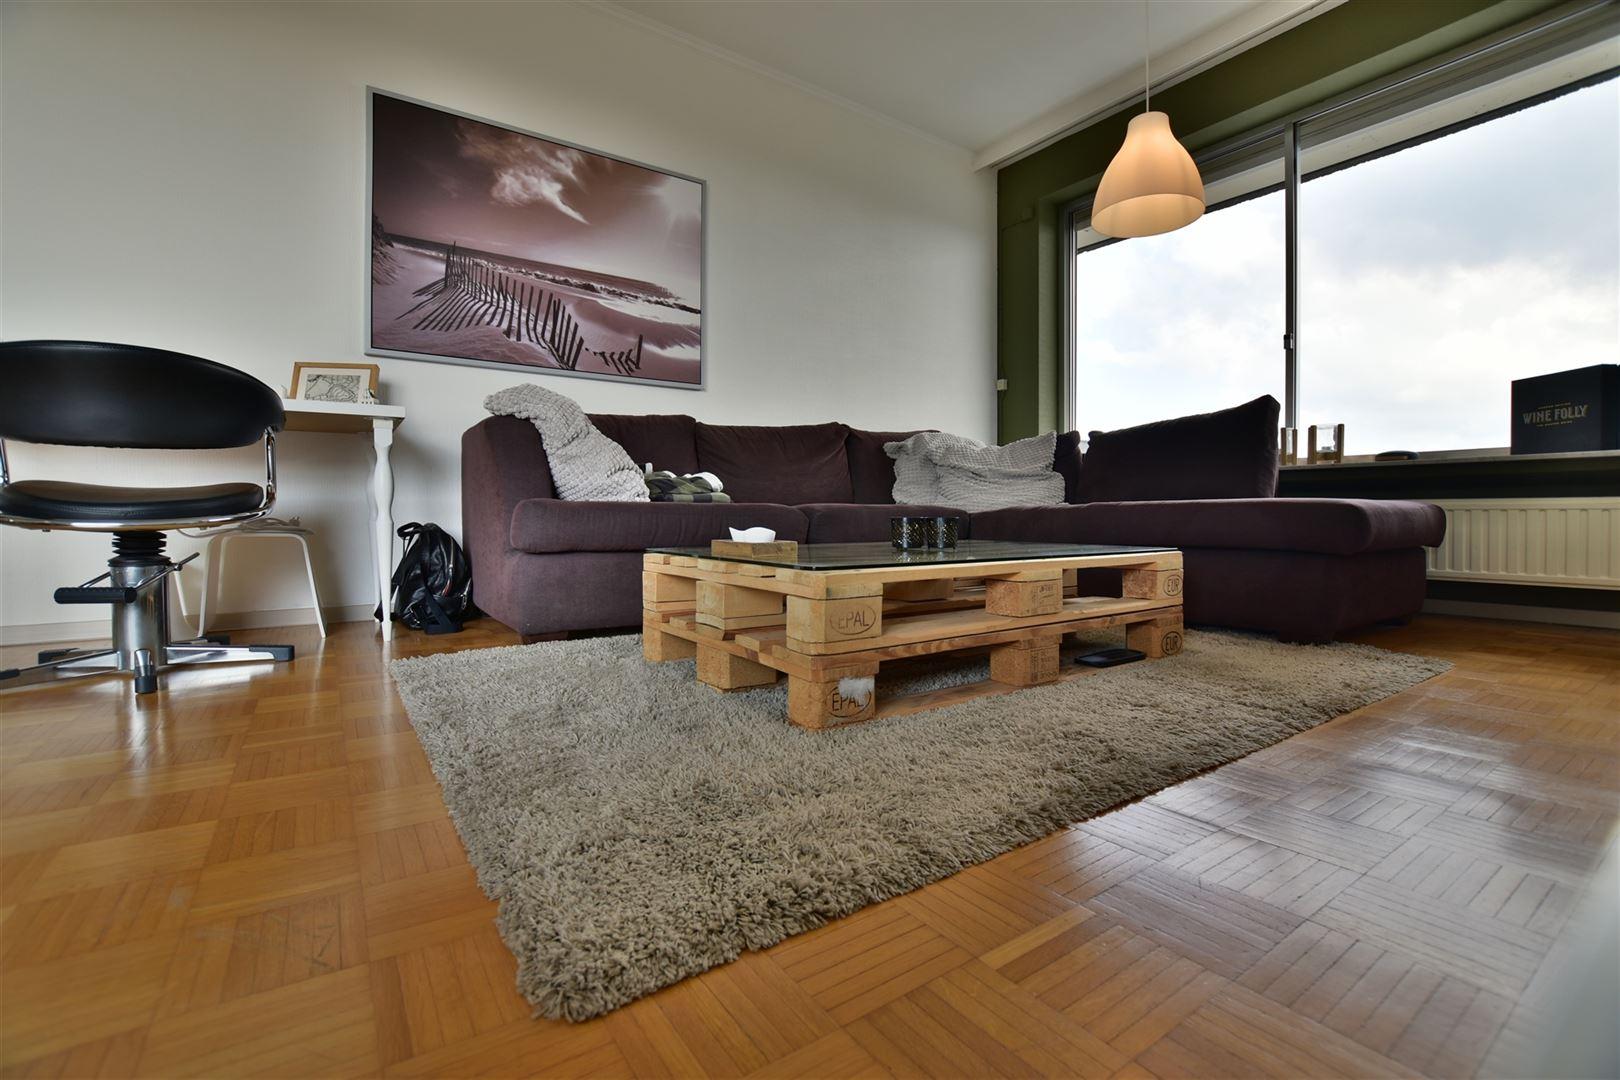 Foto 11 : Appartement te 9200 DENDERMONDE (België) - Prijs € 169.000